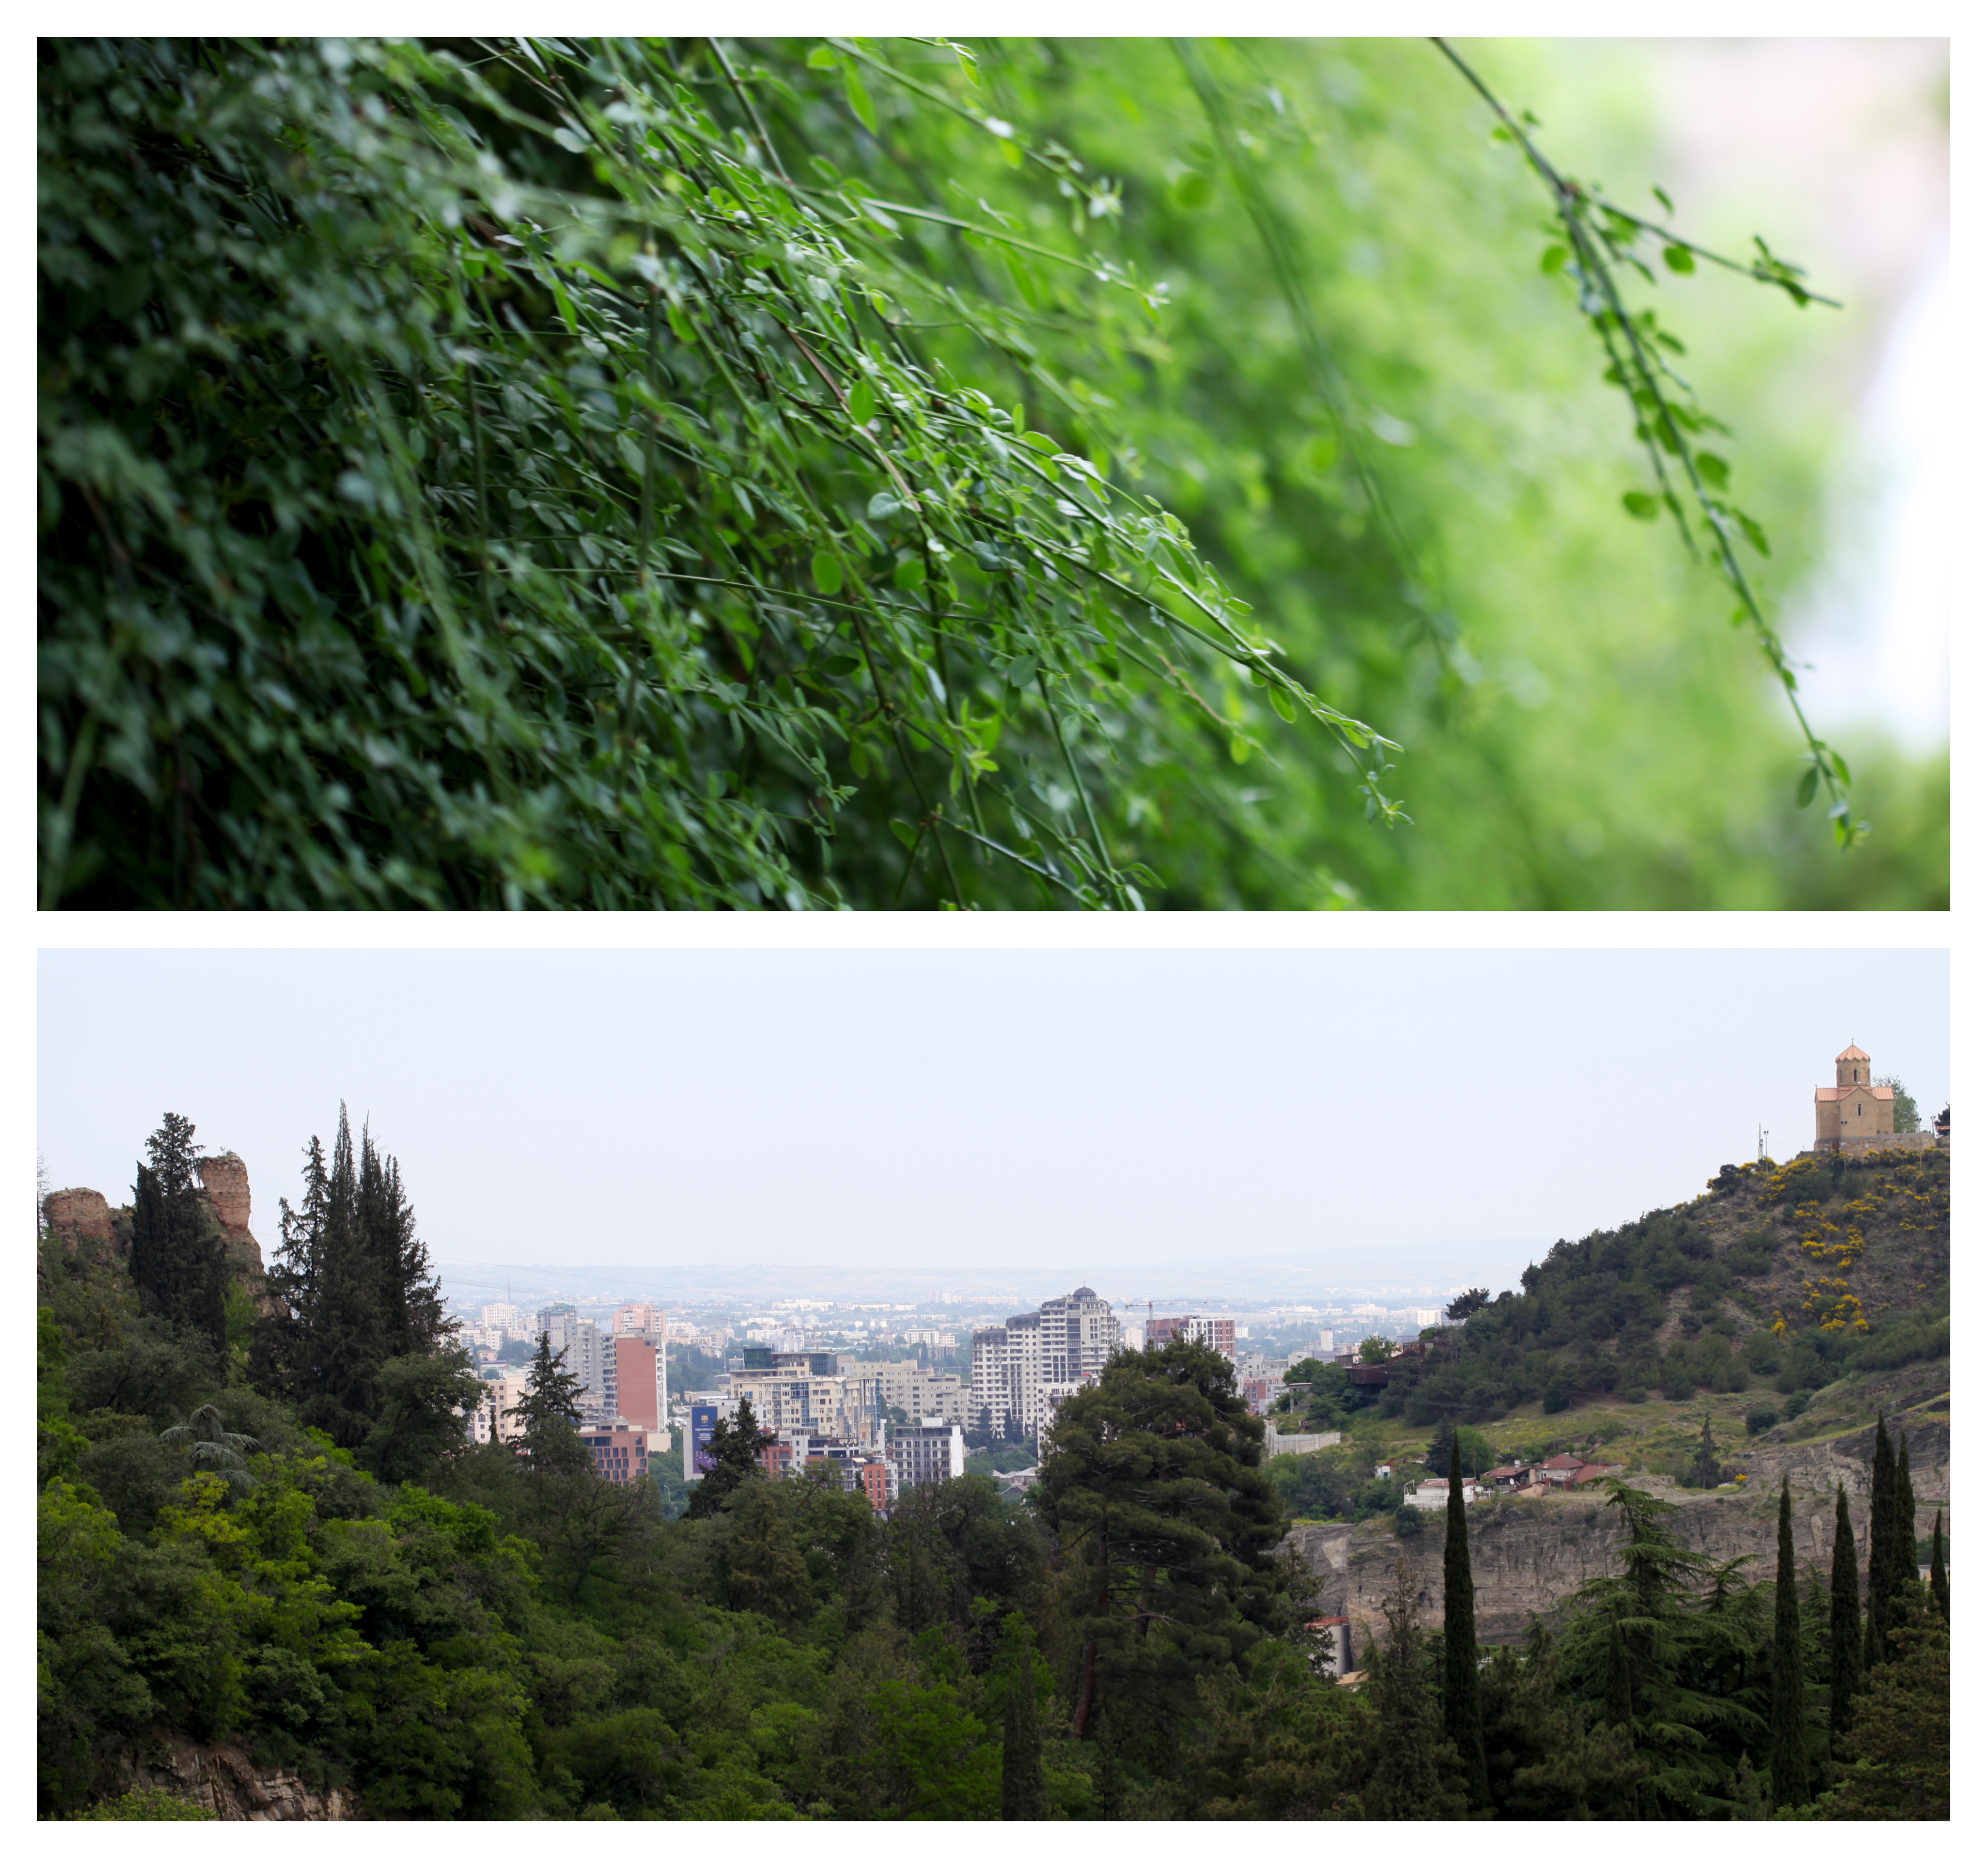 gardens1.jpg